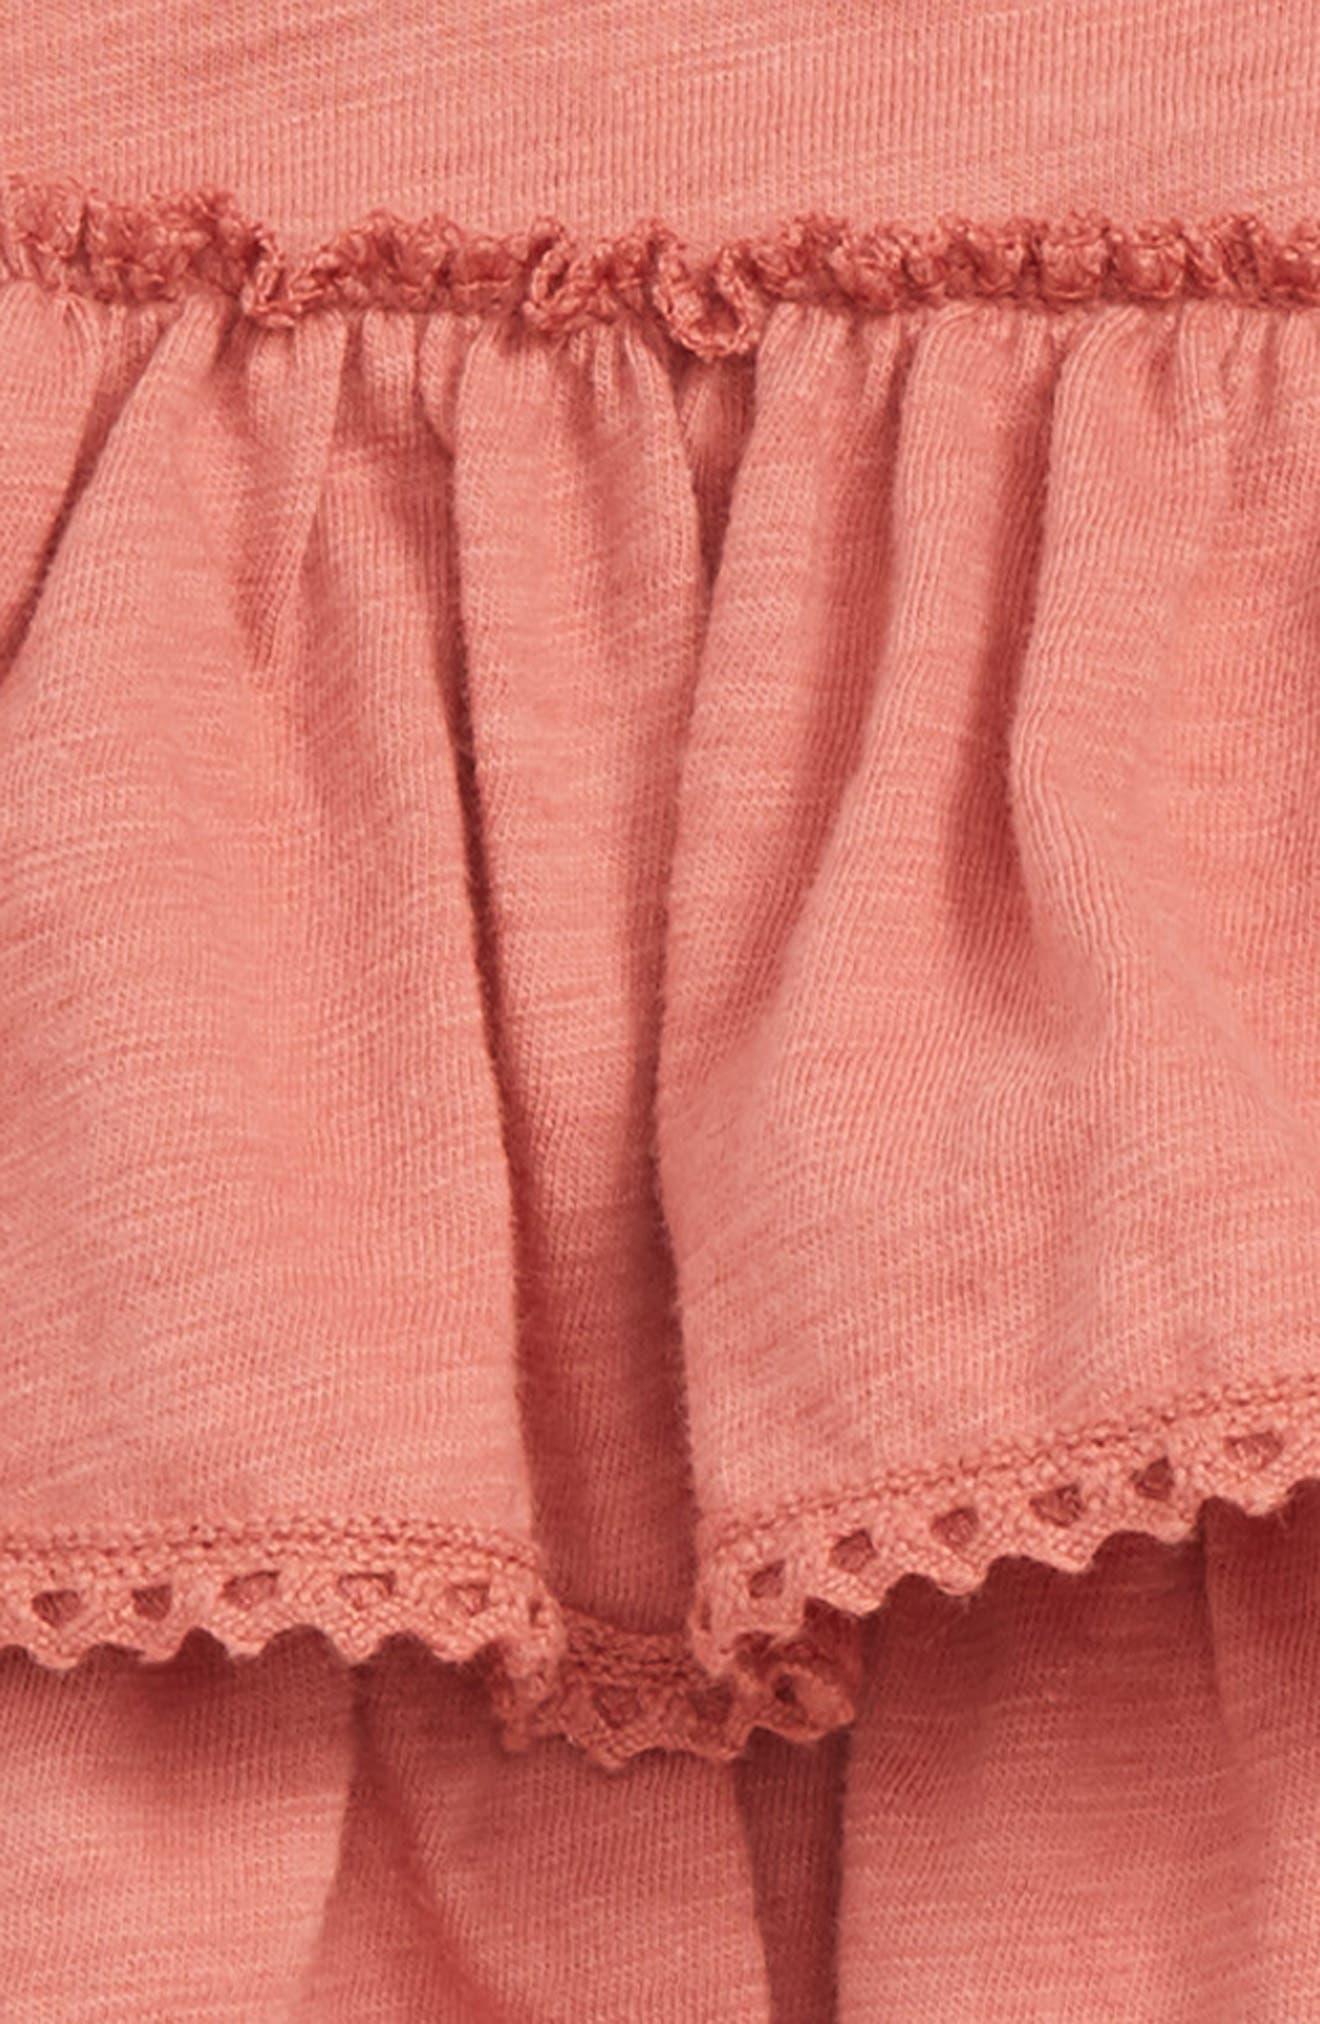 Peek Chloe Tiered Ruffle Bodysuit,                             Alternate thumbnail 2, color,                             652